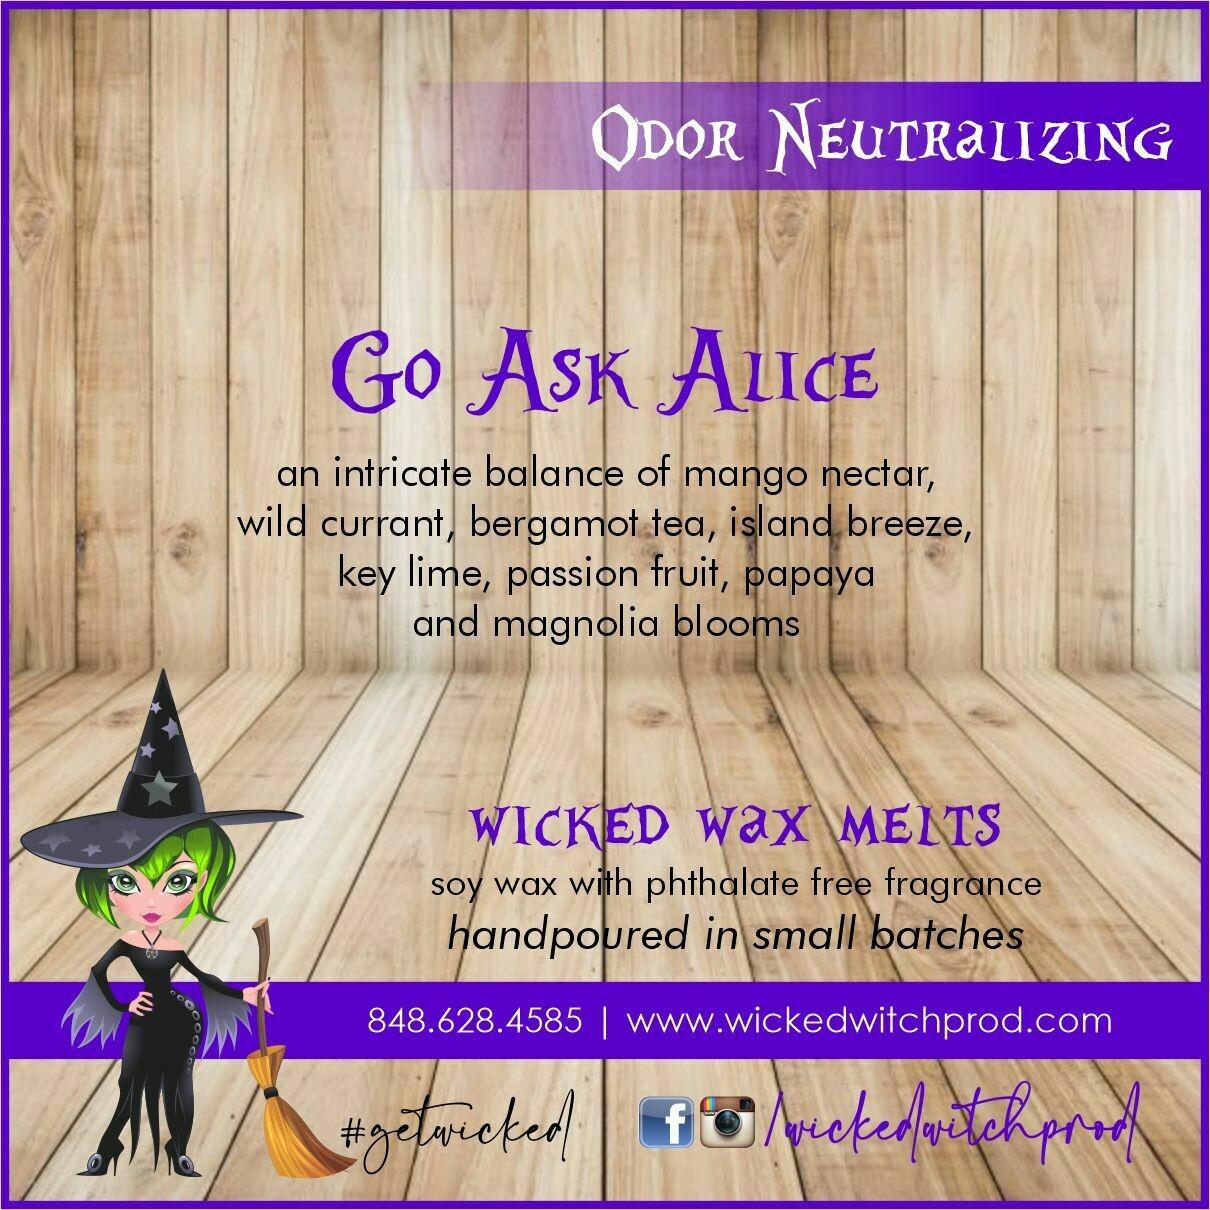 Go Ask Alice Odor Neutralizing Wax Melt